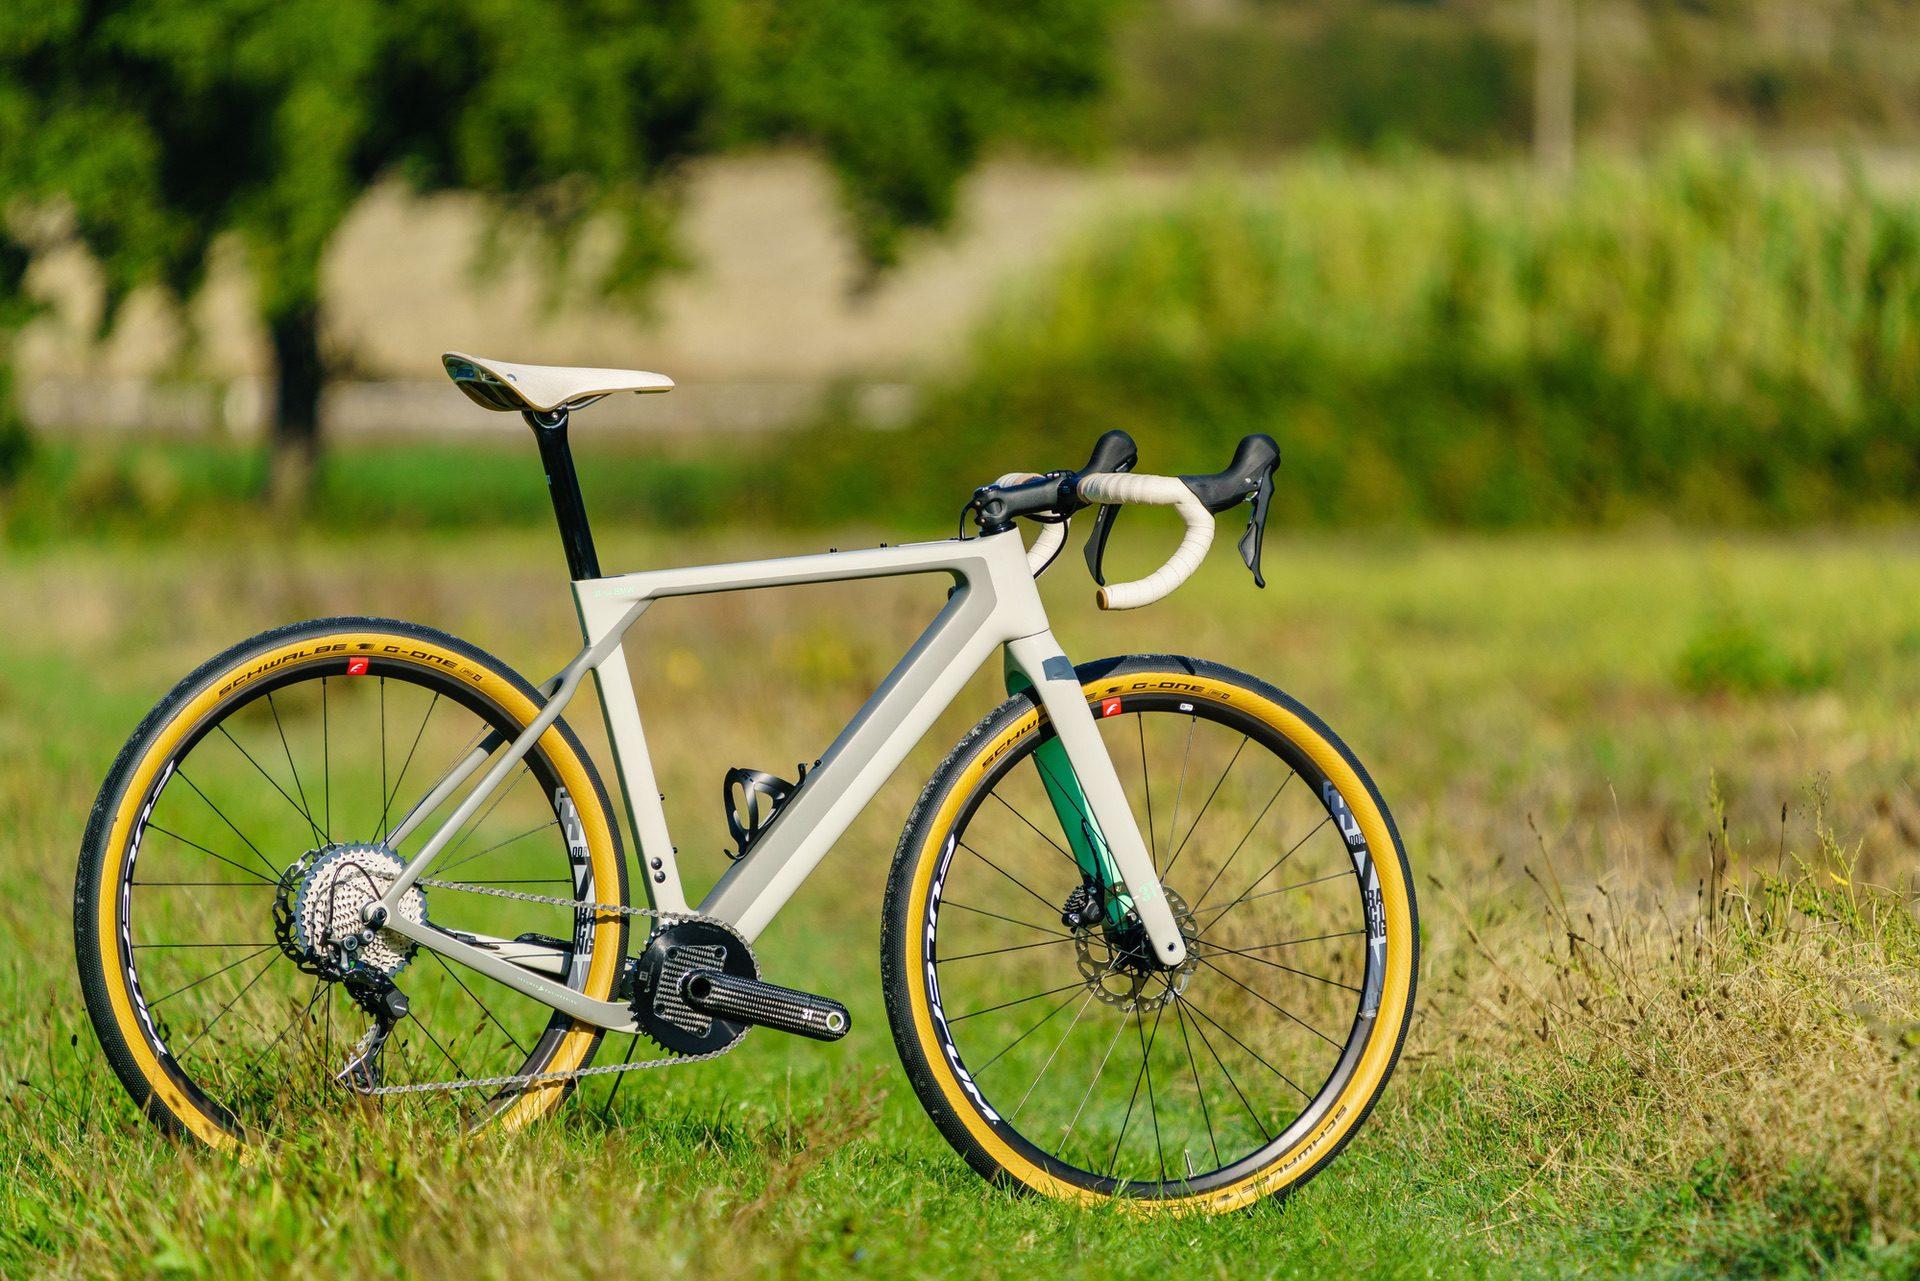 3T BMW Exploro Bike 00